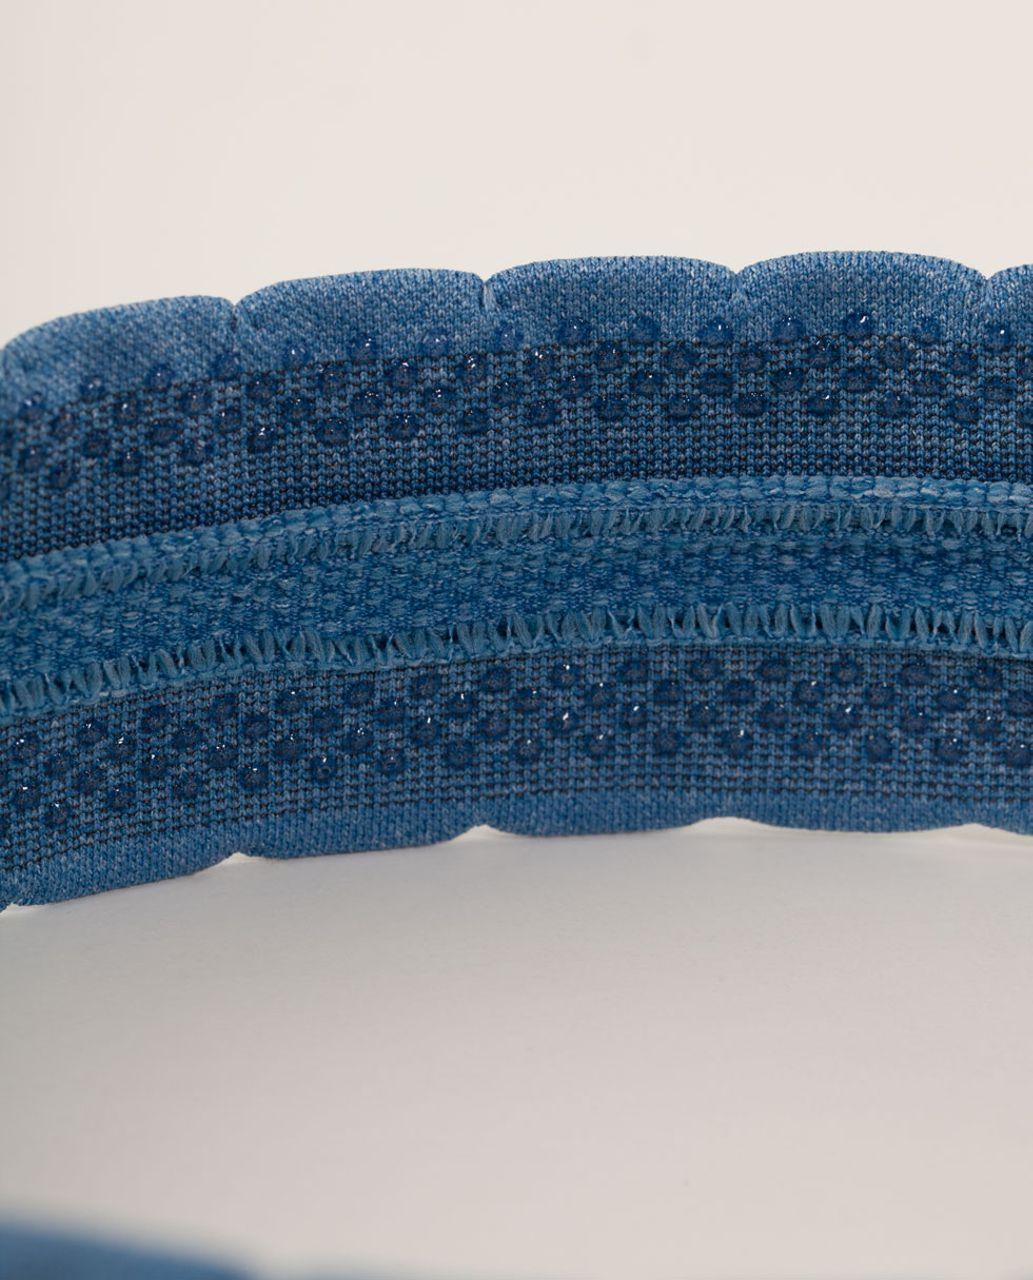 Lululemon Swiftly Headband - Limitless Blue